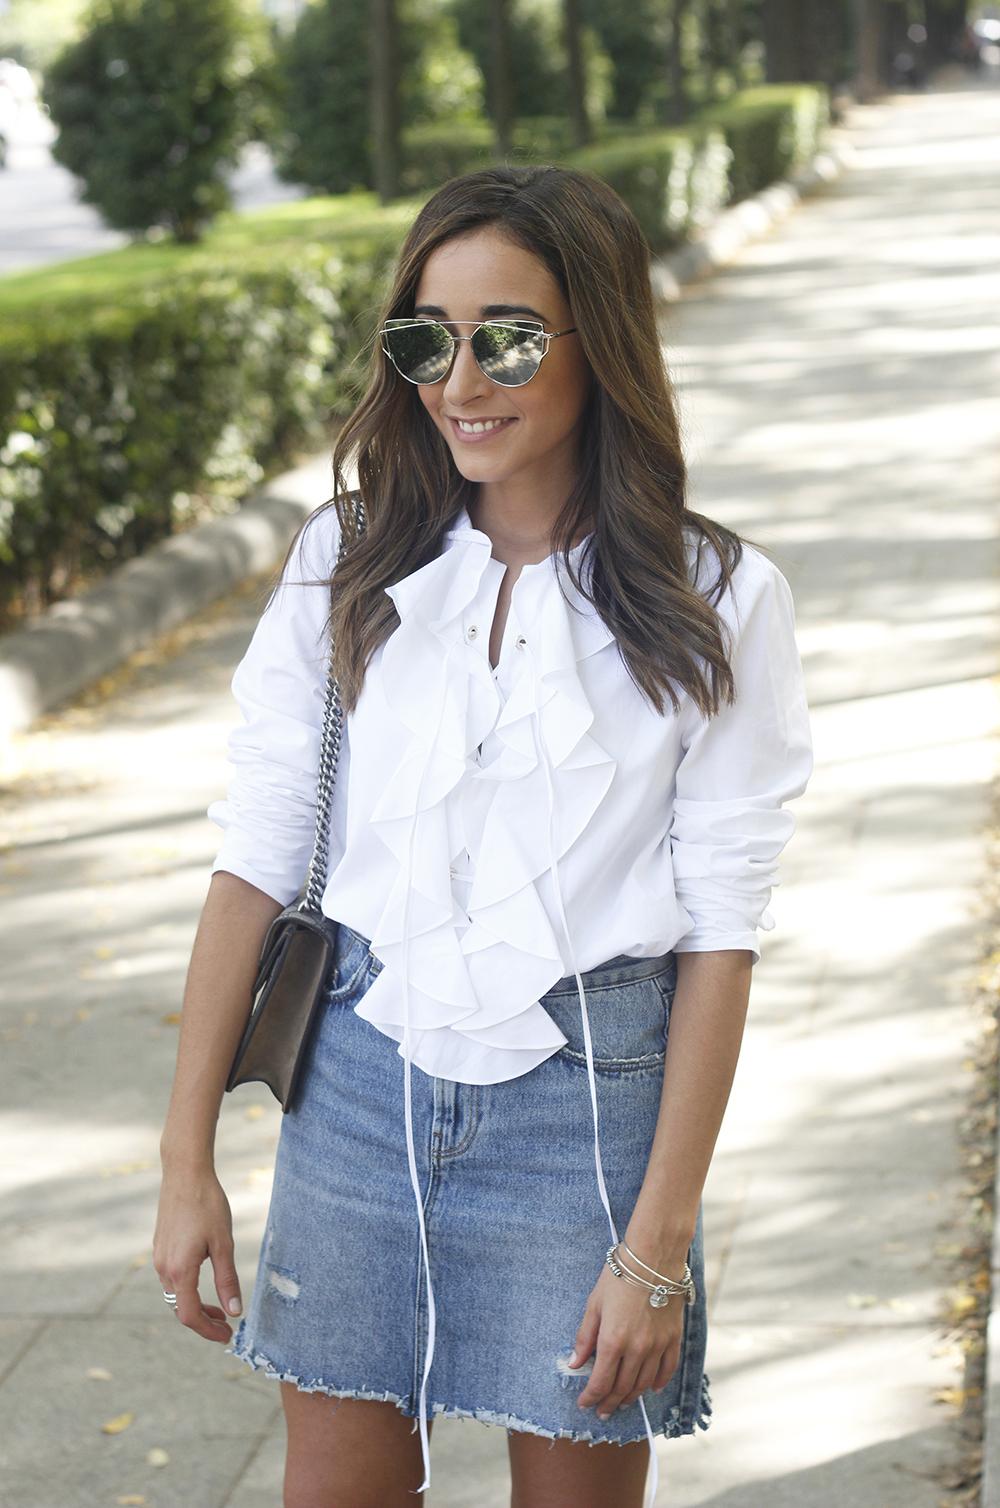 ruffled shirt uterqüe denim shirt sunnies heels gucci bag outfit fashion style15